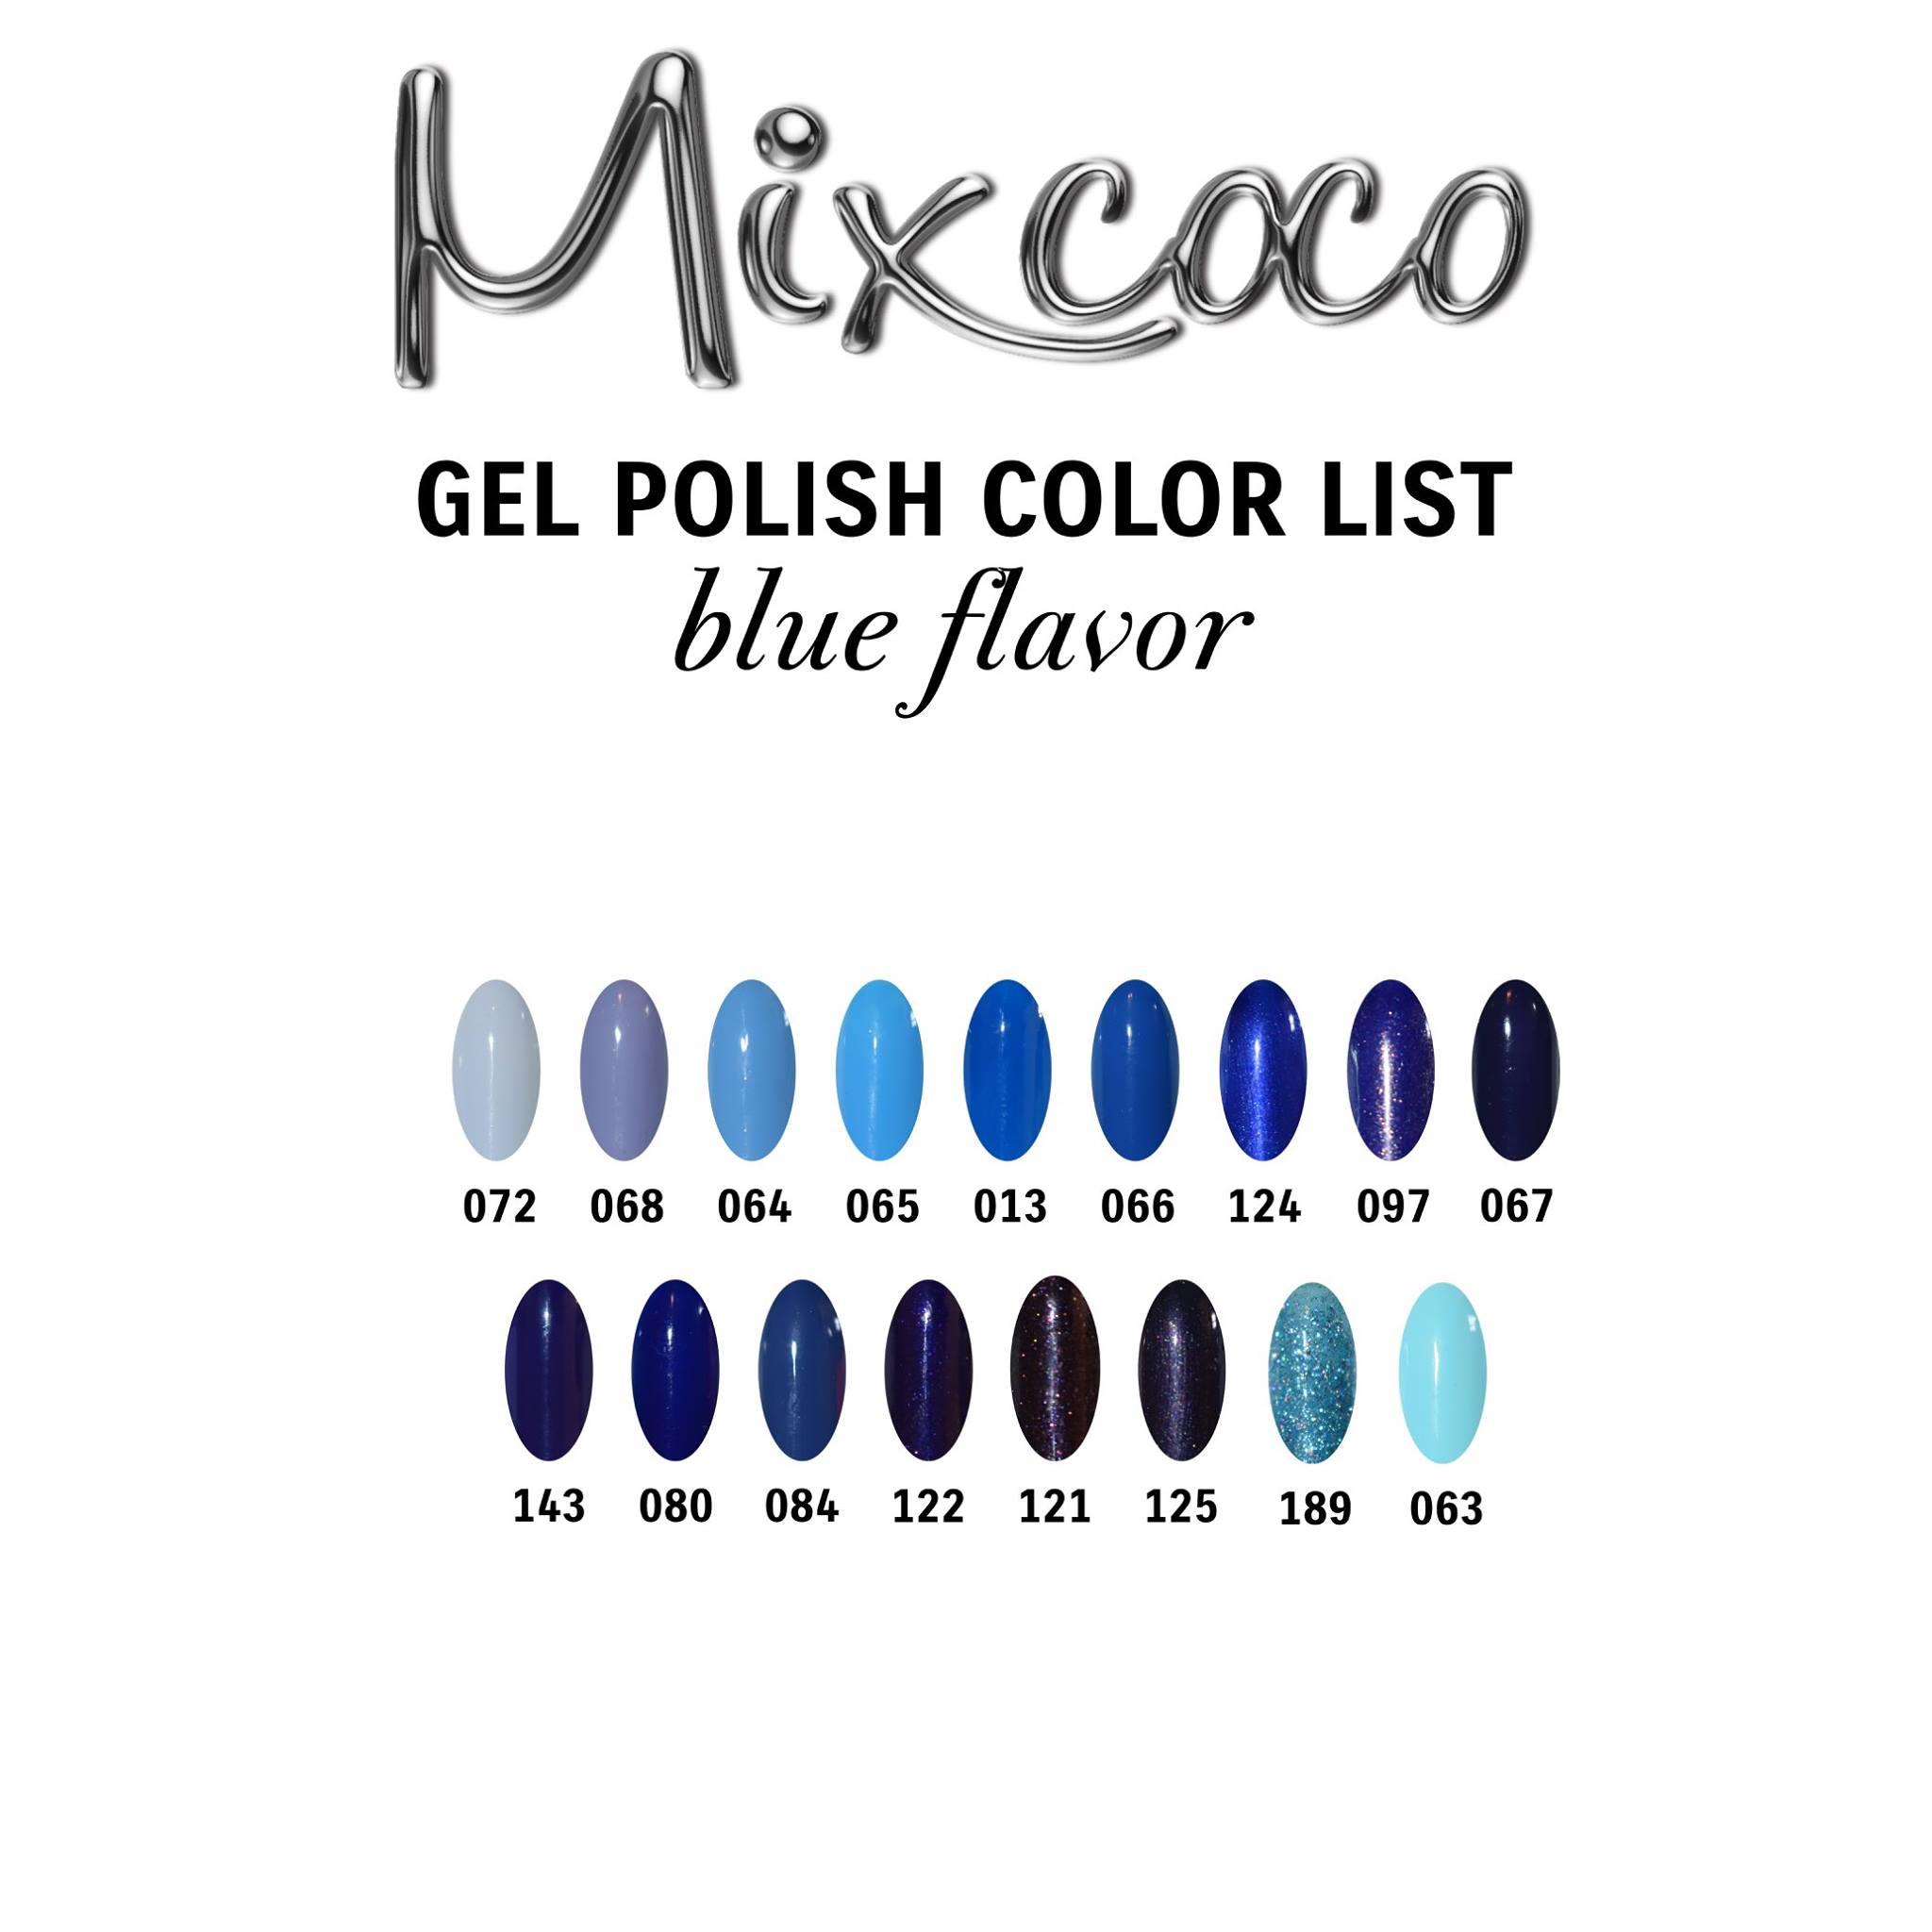 Gel Polish Color List - Blue Flavor